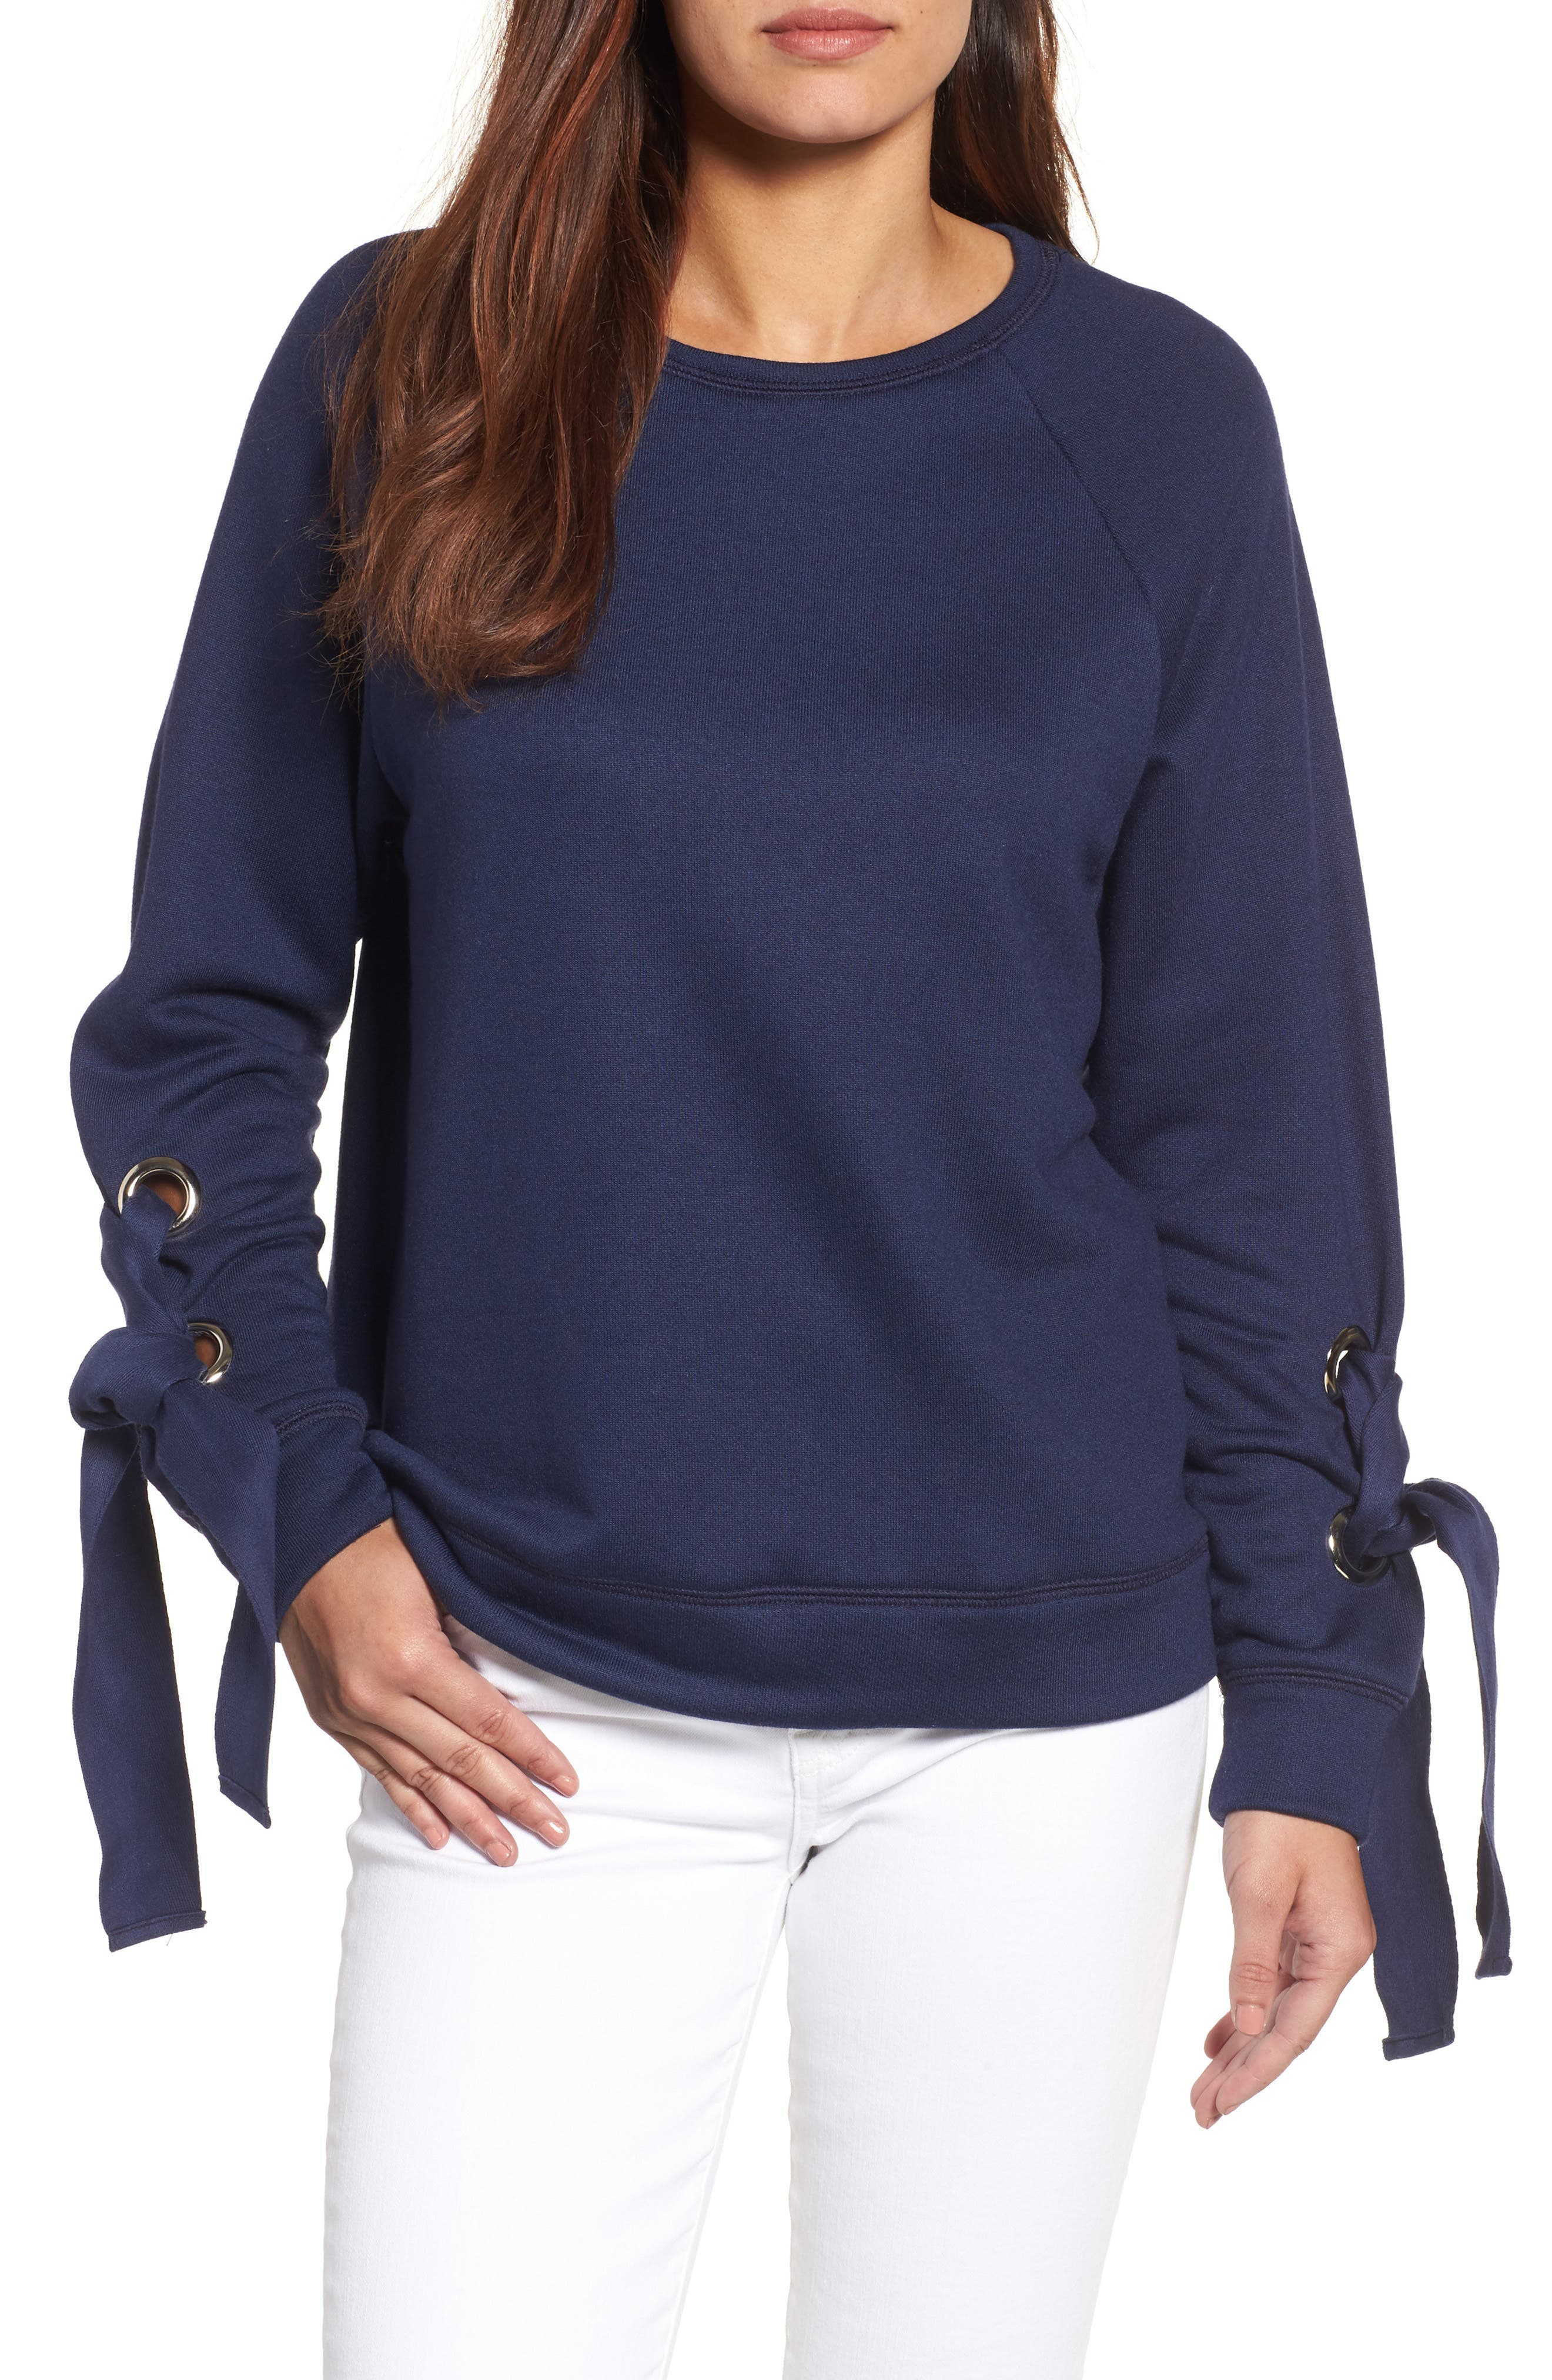 Alternate Image 1 Selected - Halogen® Tie Sleeve Sweatshirt (Regular & Petite)